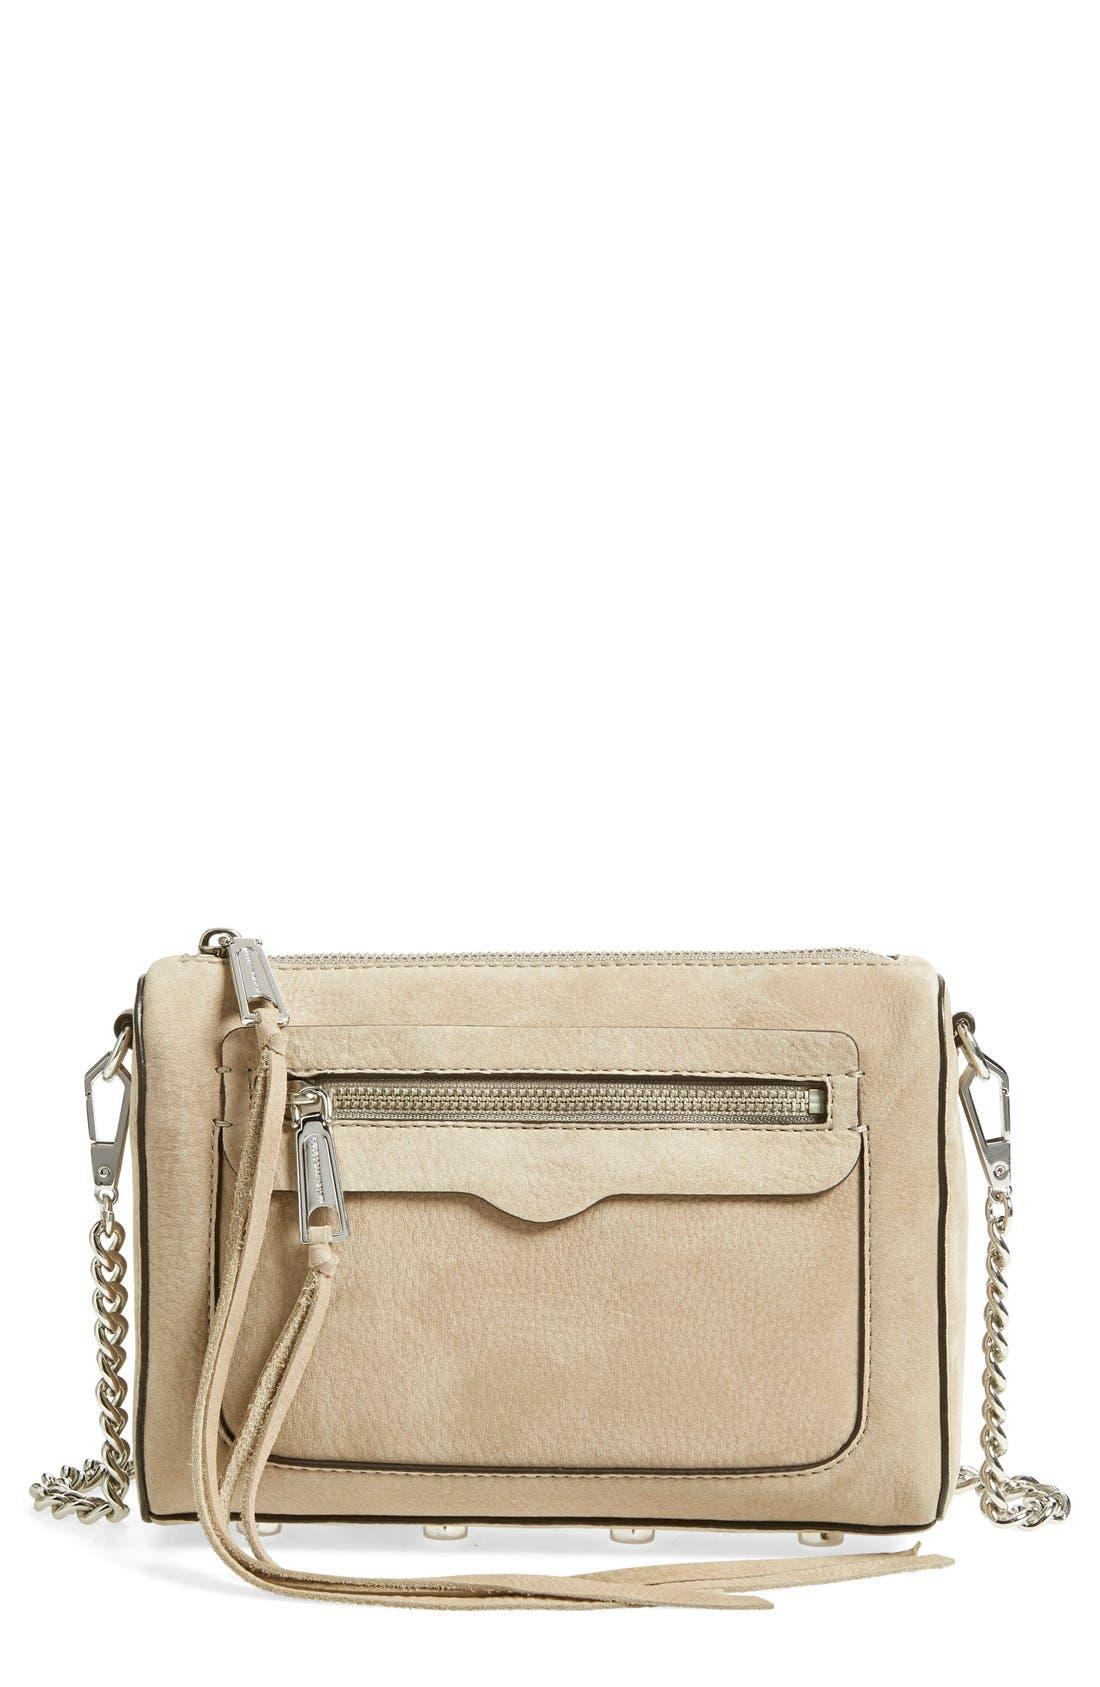 Alternate Image 1 Selected - Rebecca Minkoff 'Avery' Crossbody Bag